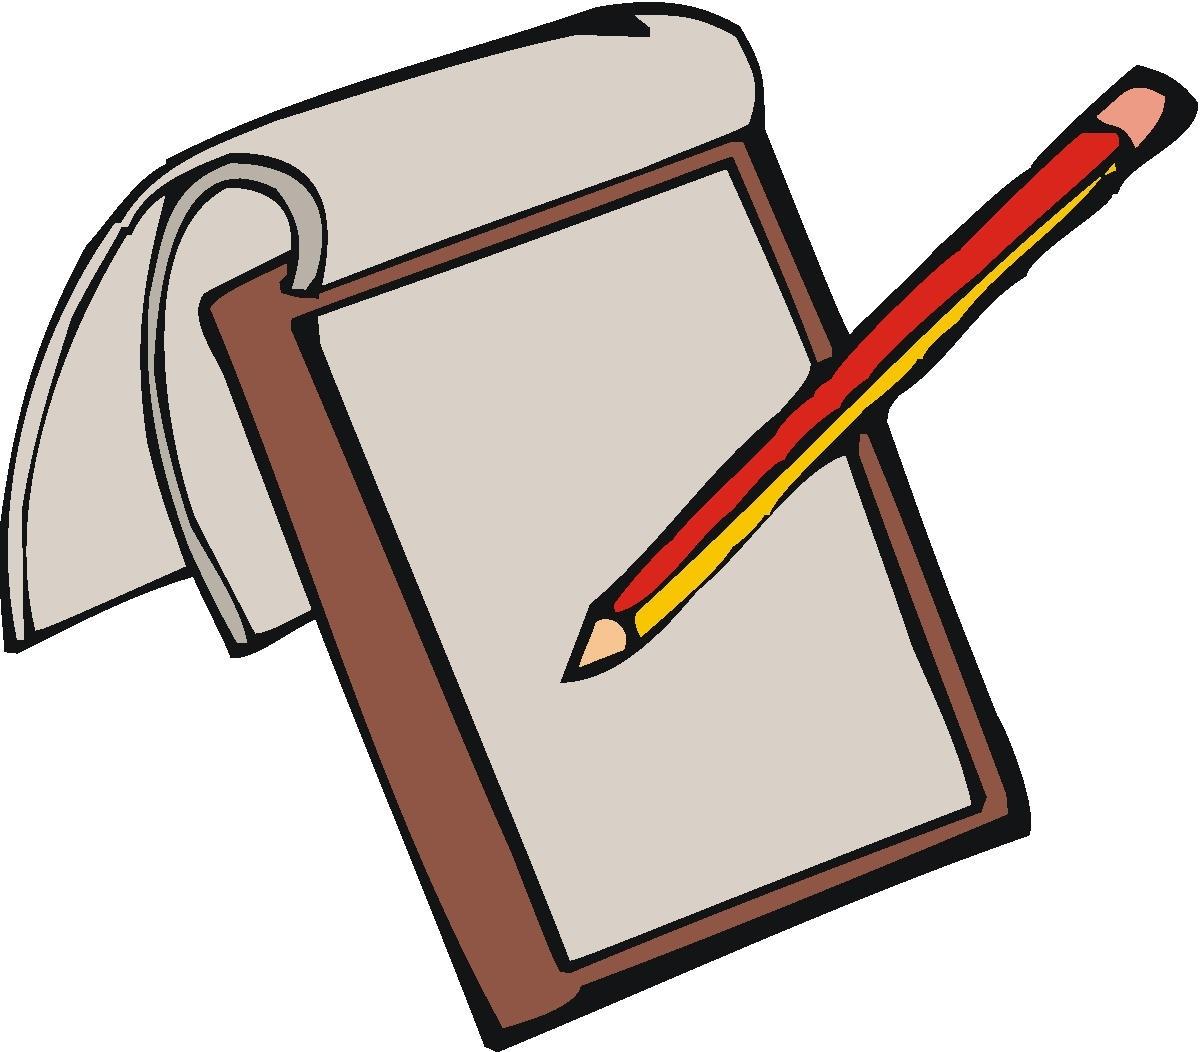 Kindergarten writing paper clipart clip free stock Kids writing paper clipart - ClipartFest clip free stock